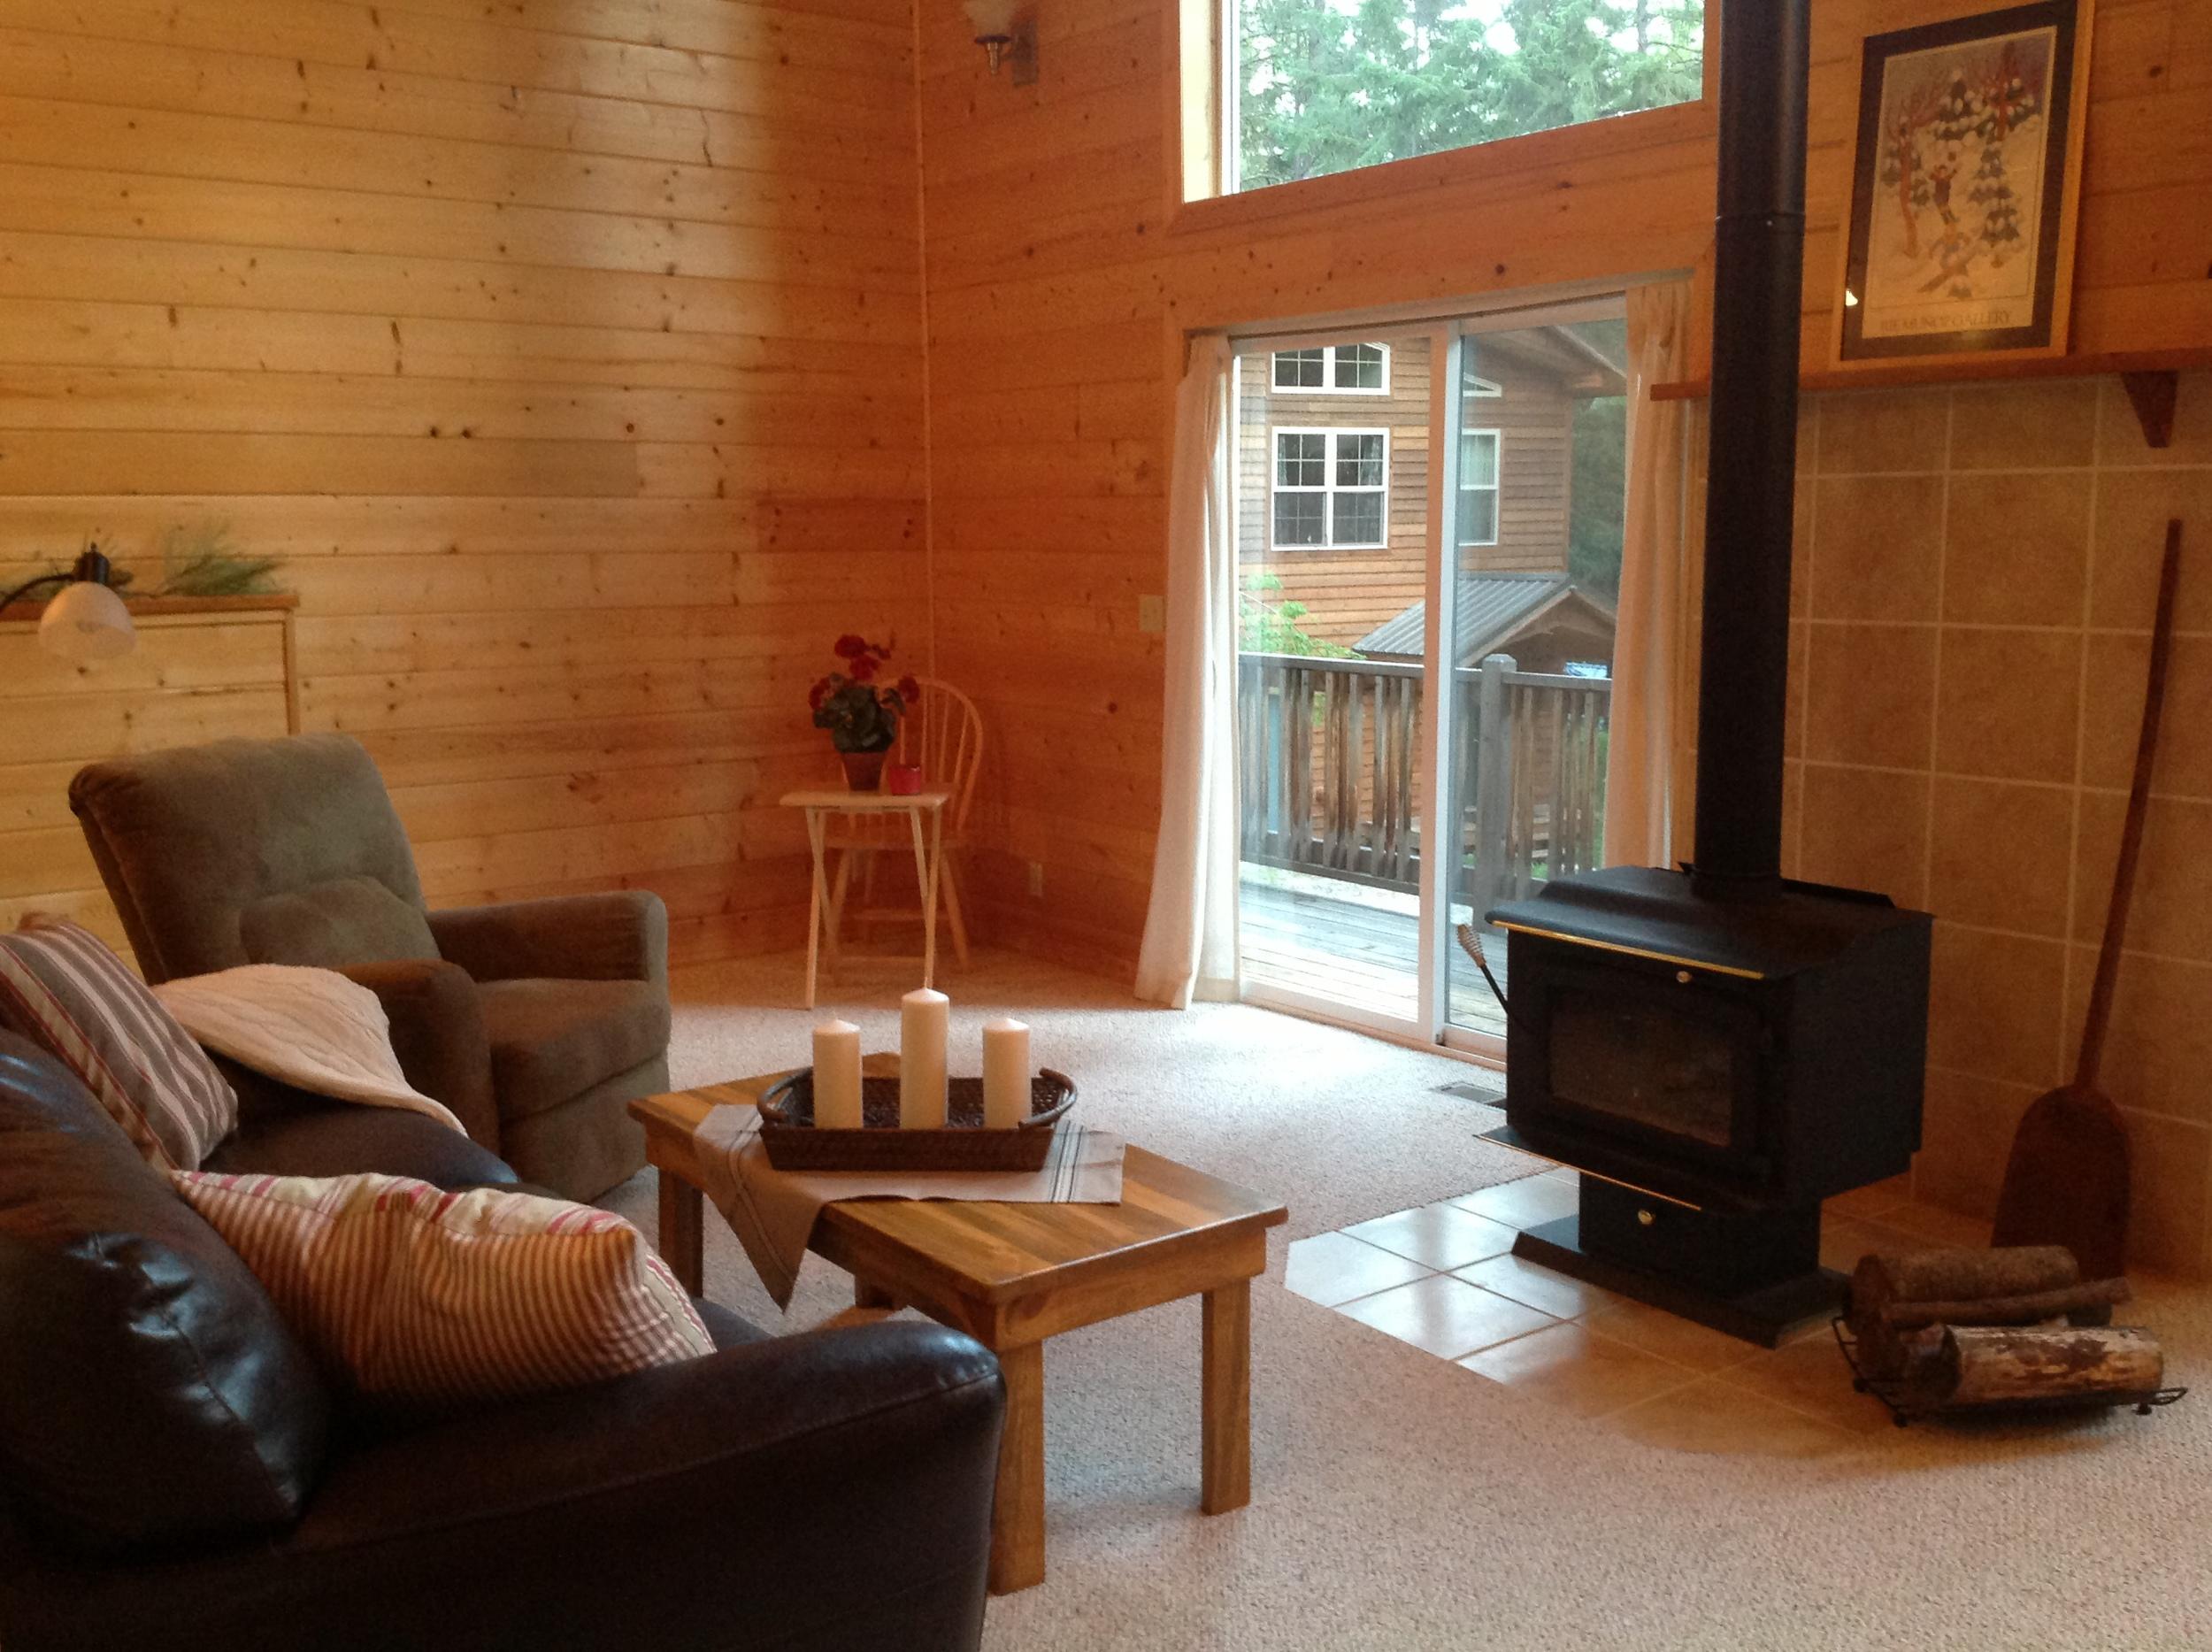 Living Room after...